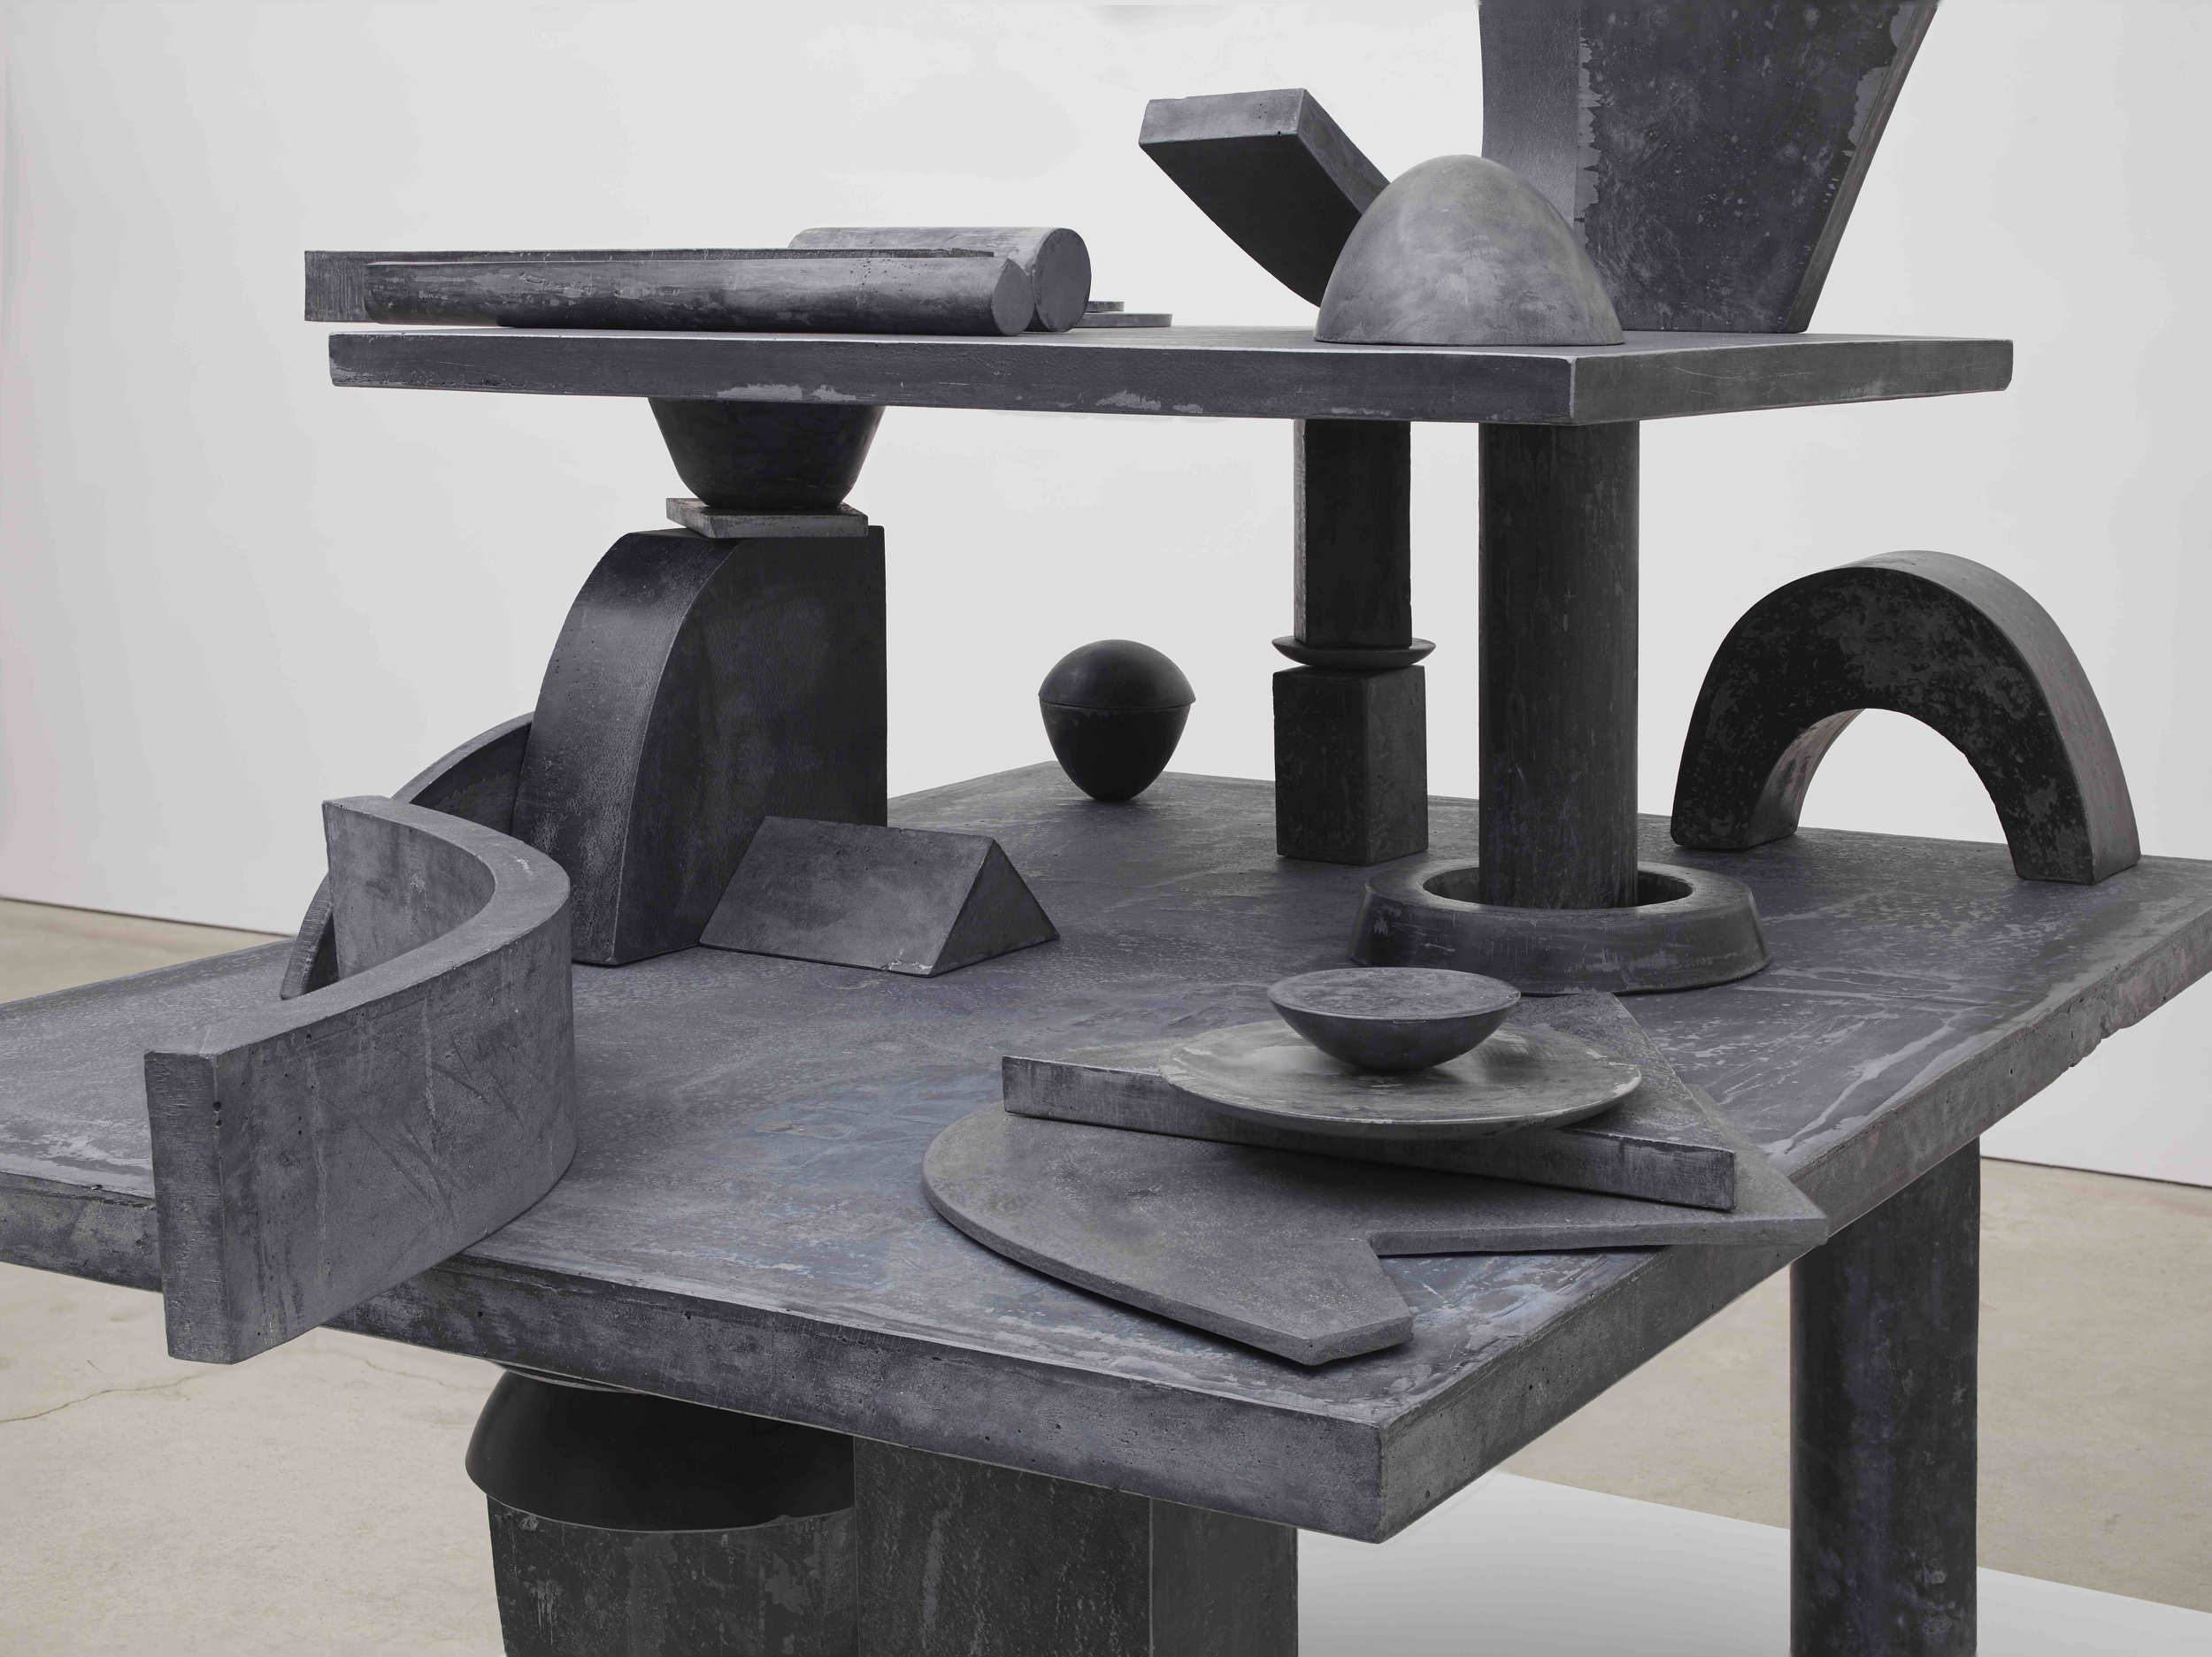 Erin Shirreff  Catalogue, 39 parts (Value Lesson) (Detail) 2015 Hydrostone, pigment, graphite, steel armatures 57h x 65 ¼w x 53d in